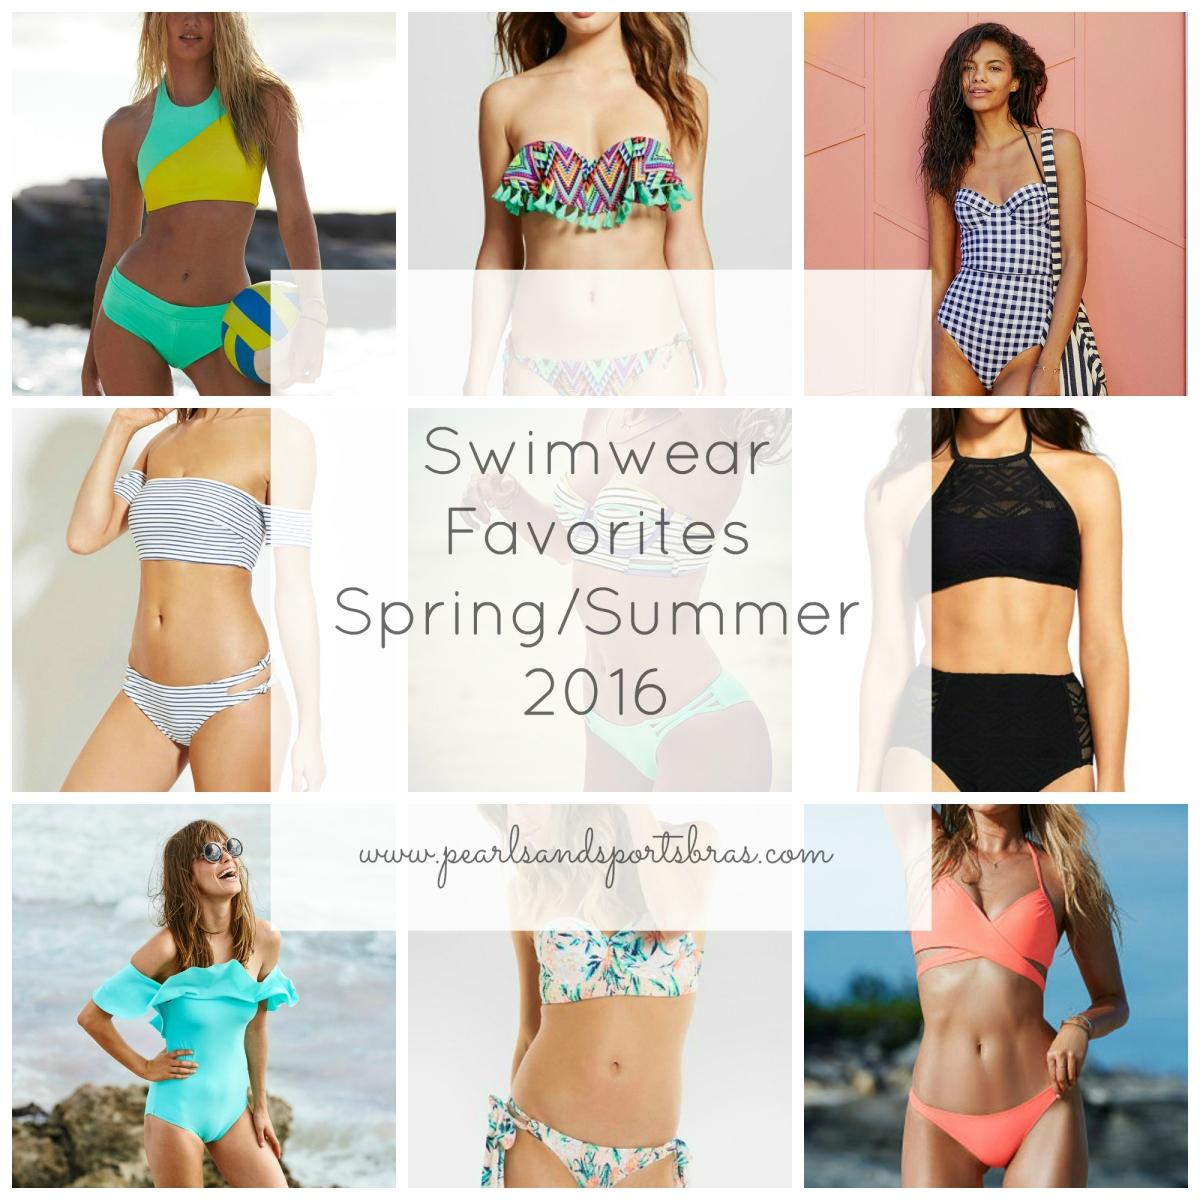 Swimwear Favorites: Spring/Summer 2016 |www.pearlsandsportsbras.com|